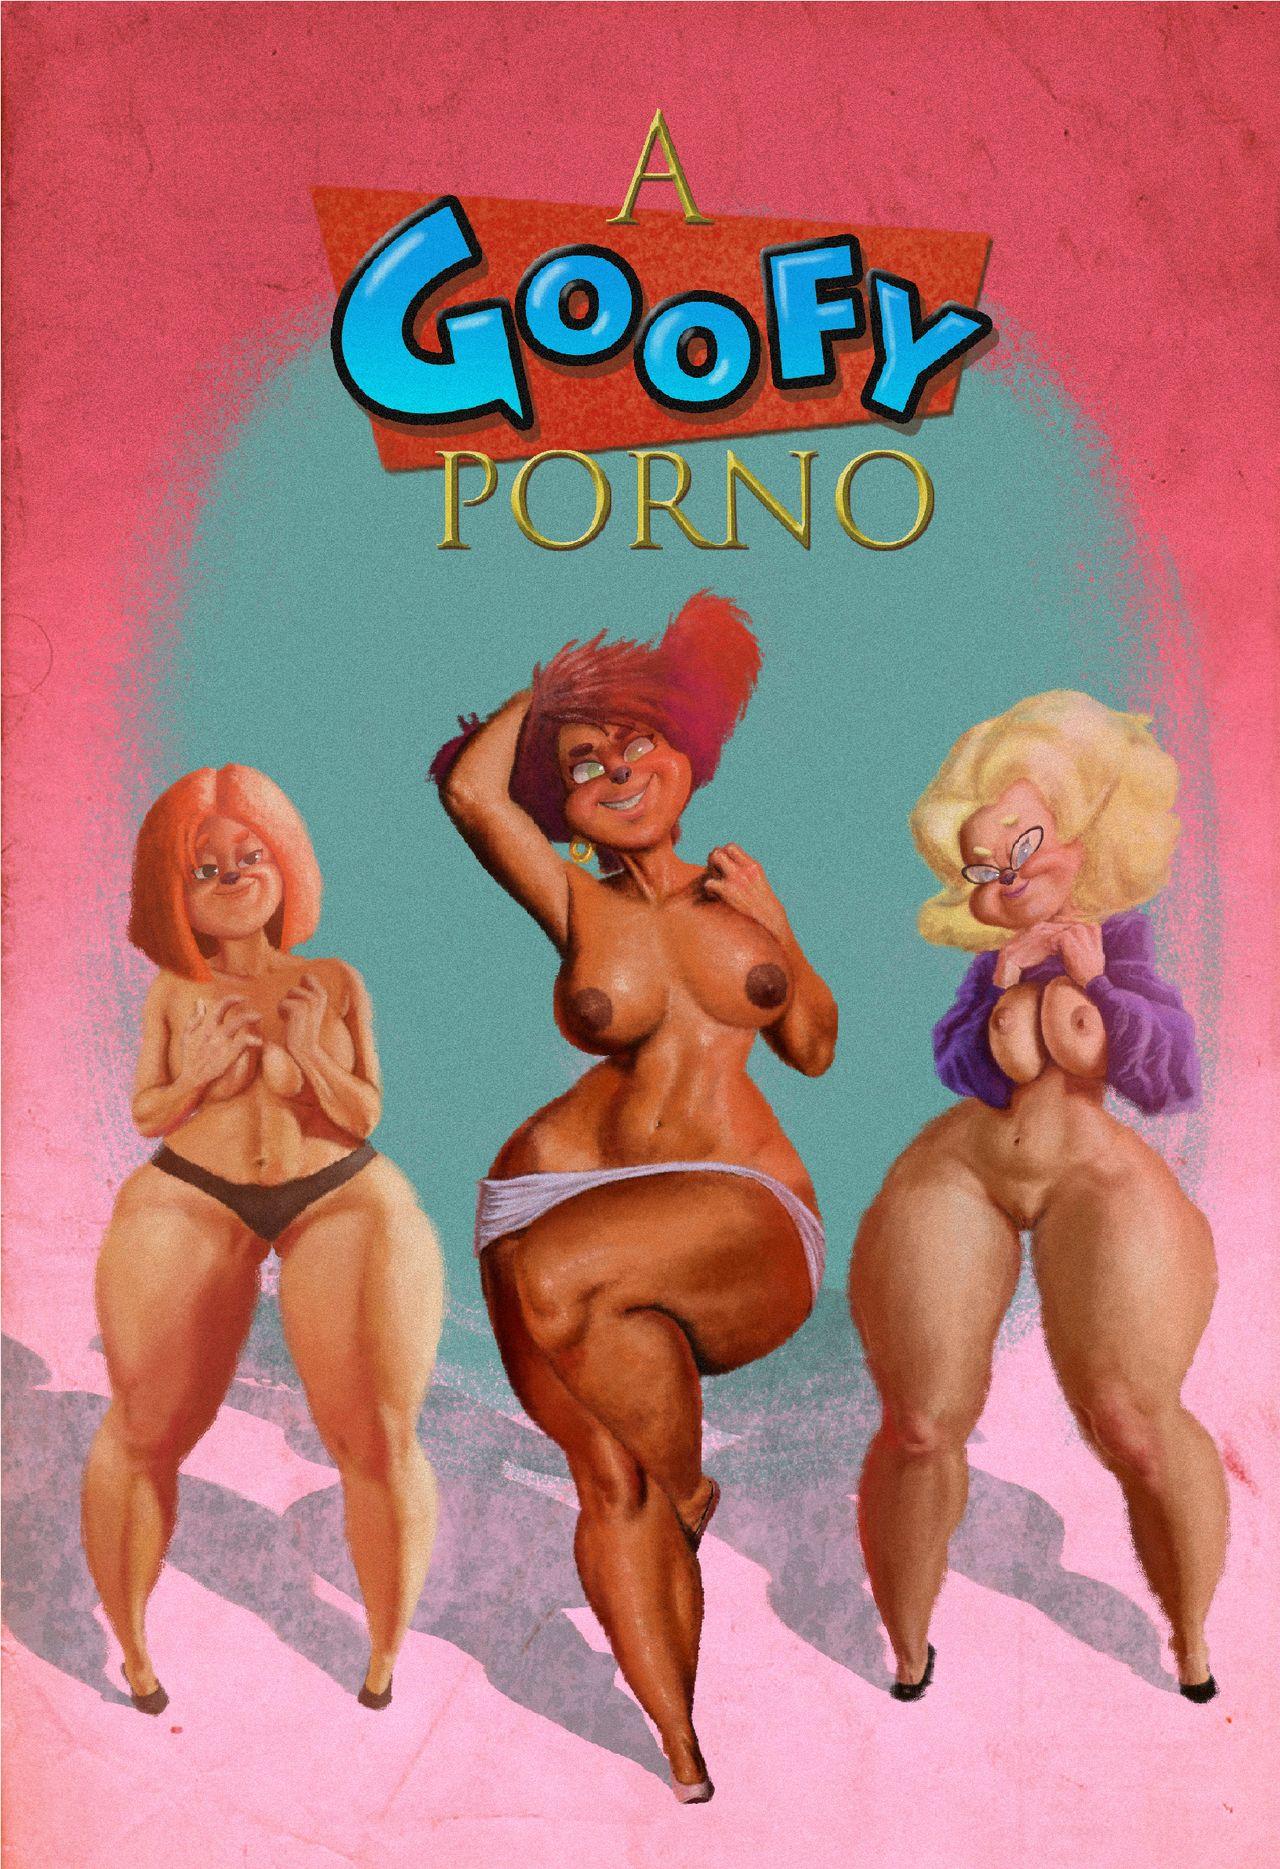 A Goofy Porno- Grigori porn comics 8 muses